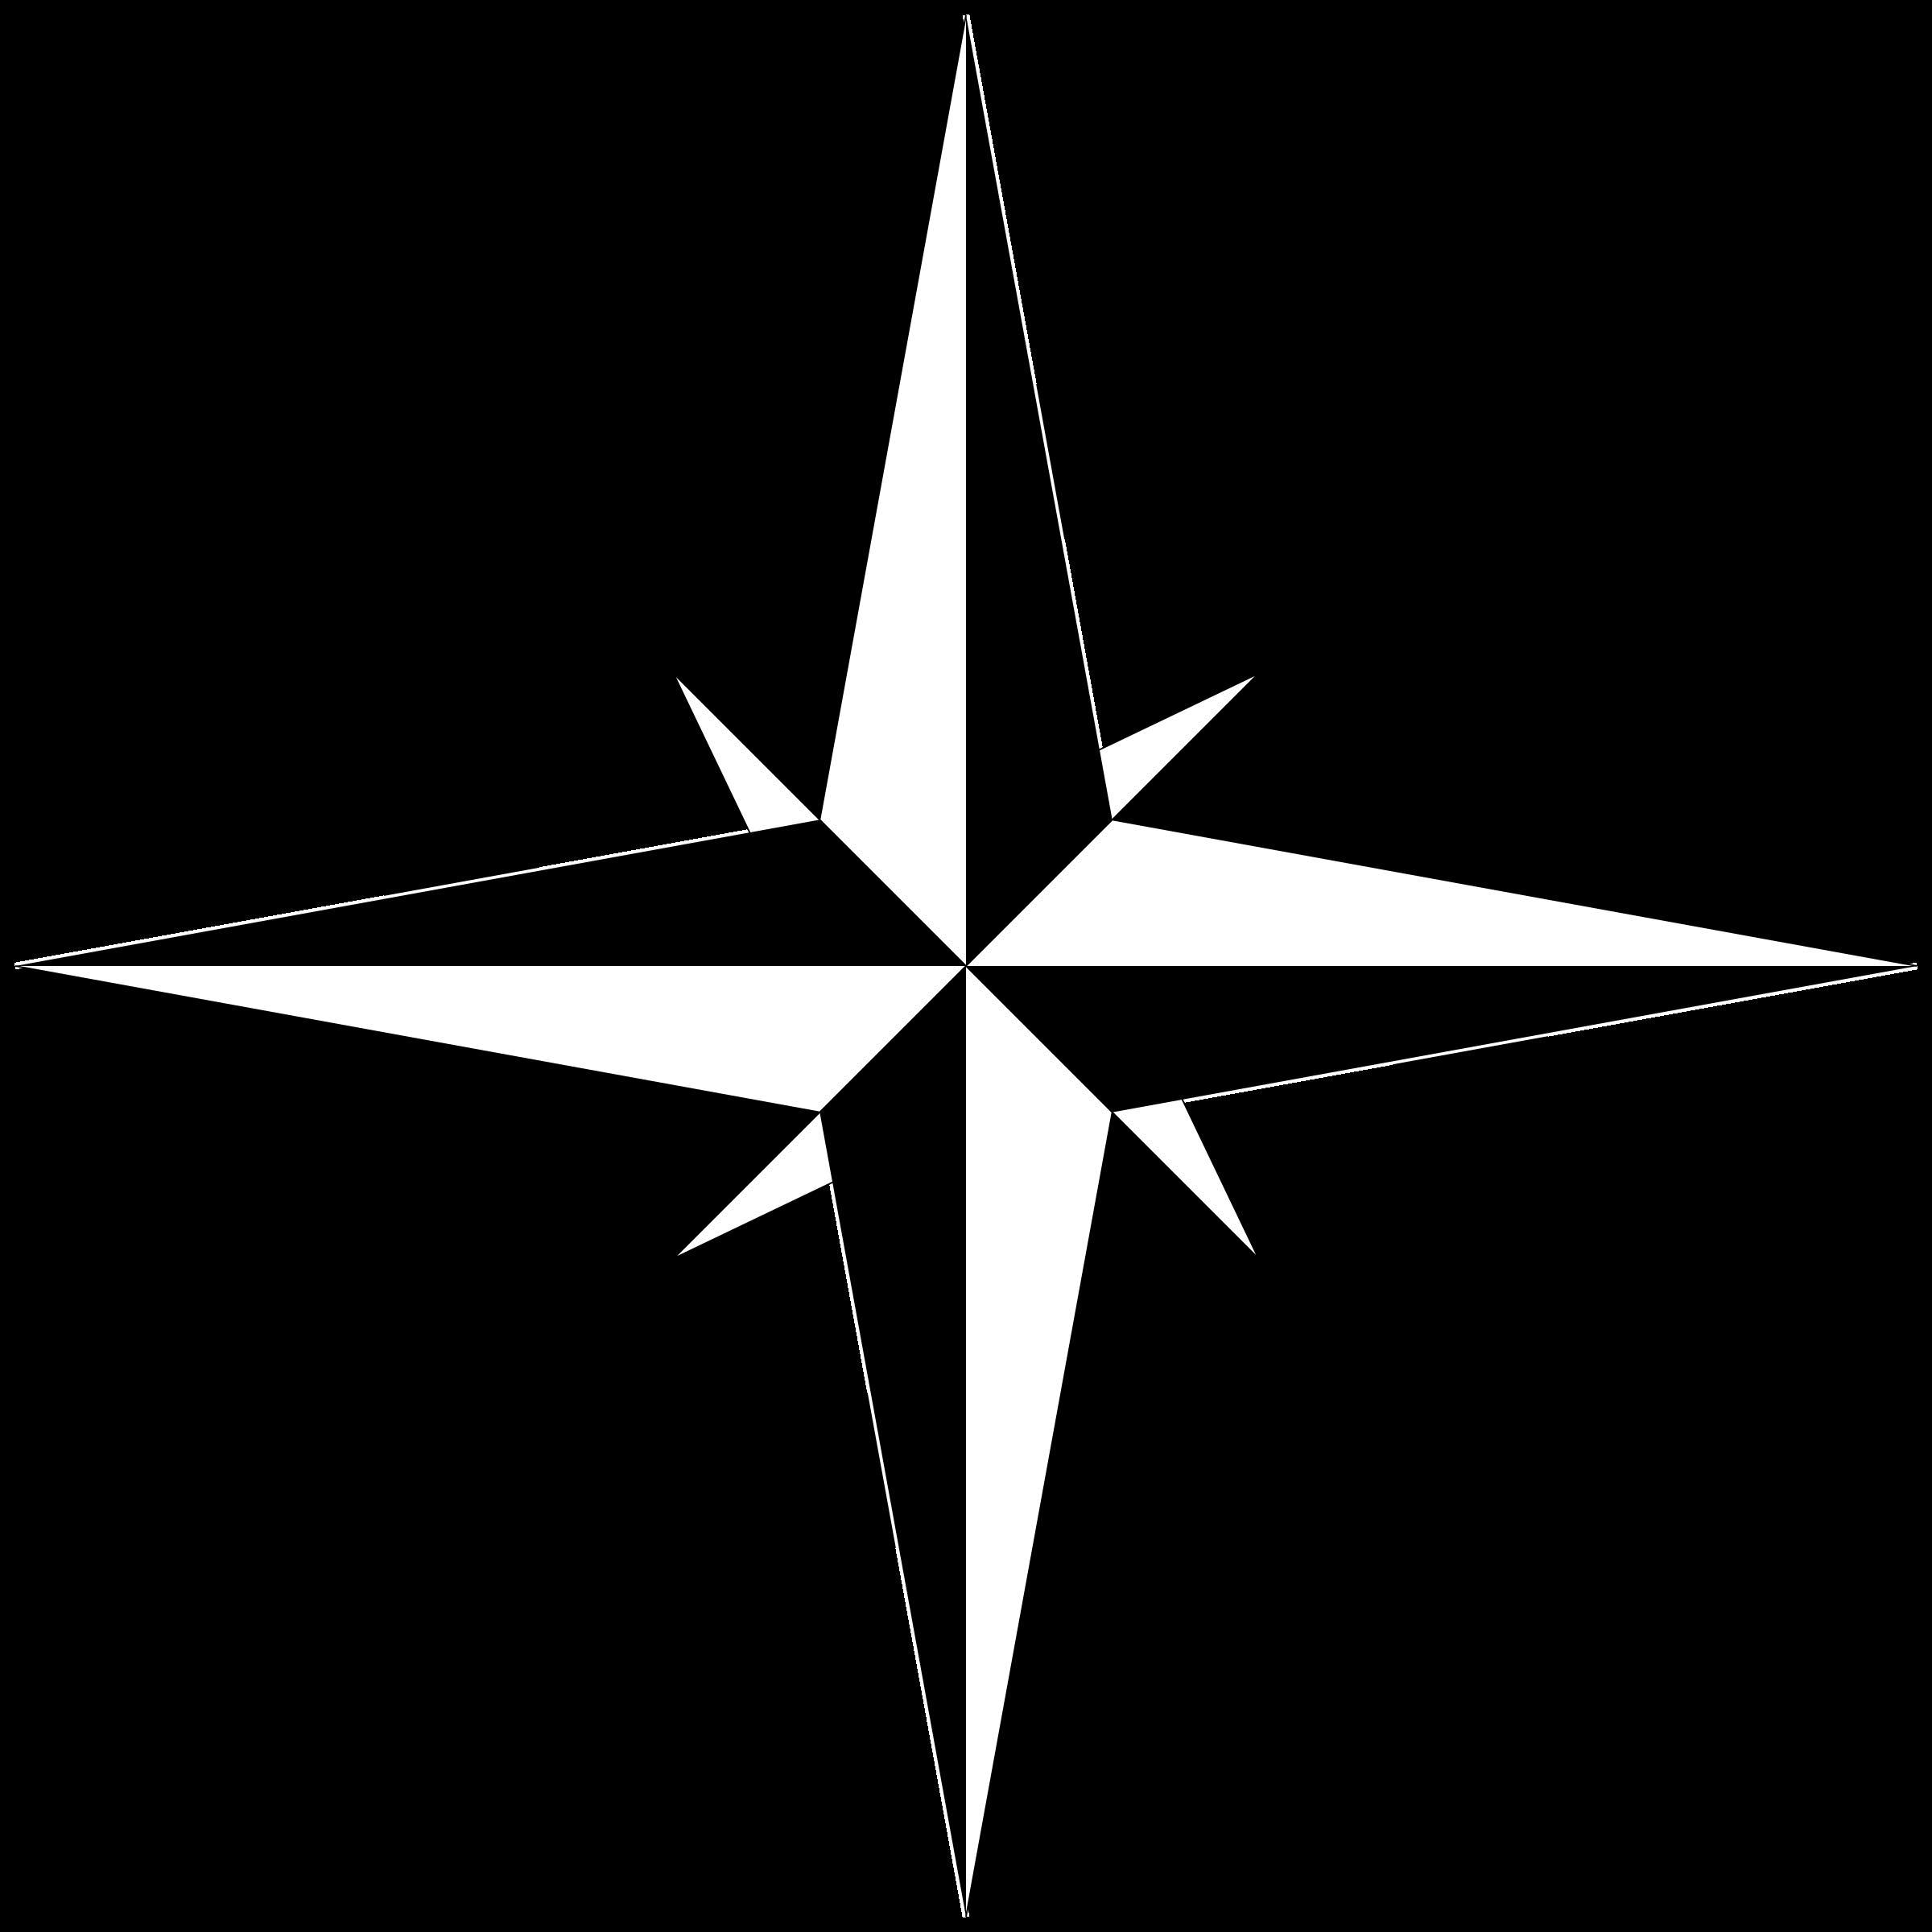 Compass rose png black. Detective clipart legal